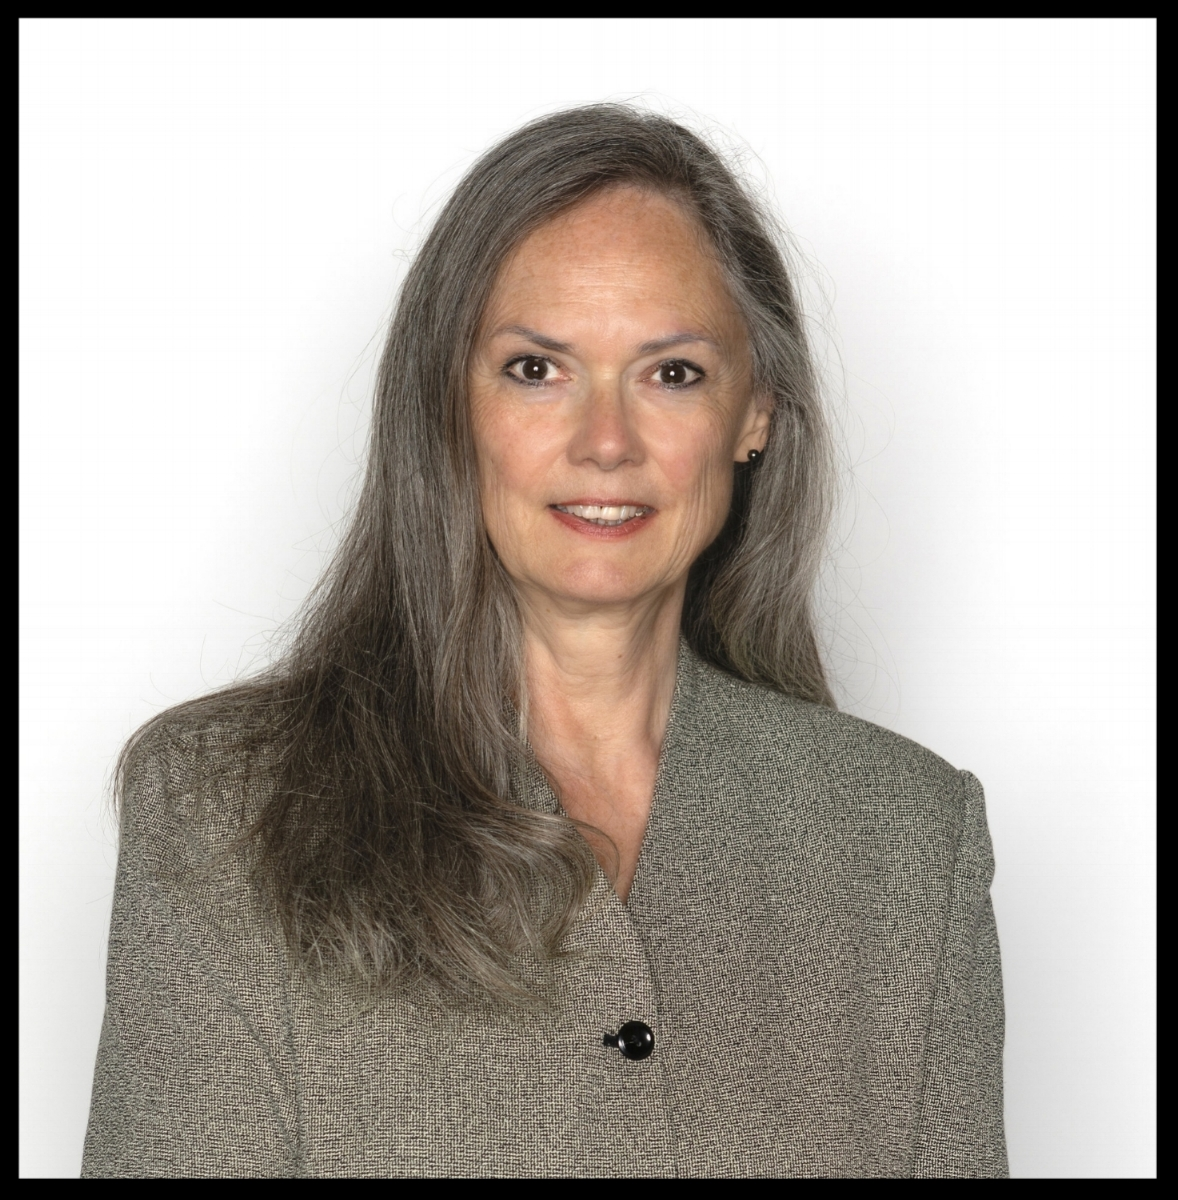 Miriam Brown, CSEO, CEO, CEI - Compliance OfficerViva Escrow! Inc. 136 W. Walnut AvenueMonrovia, CA 91016www.vivaescrow.comEmail: miriam@vivaescrow.comOffice: (626) 584-9999